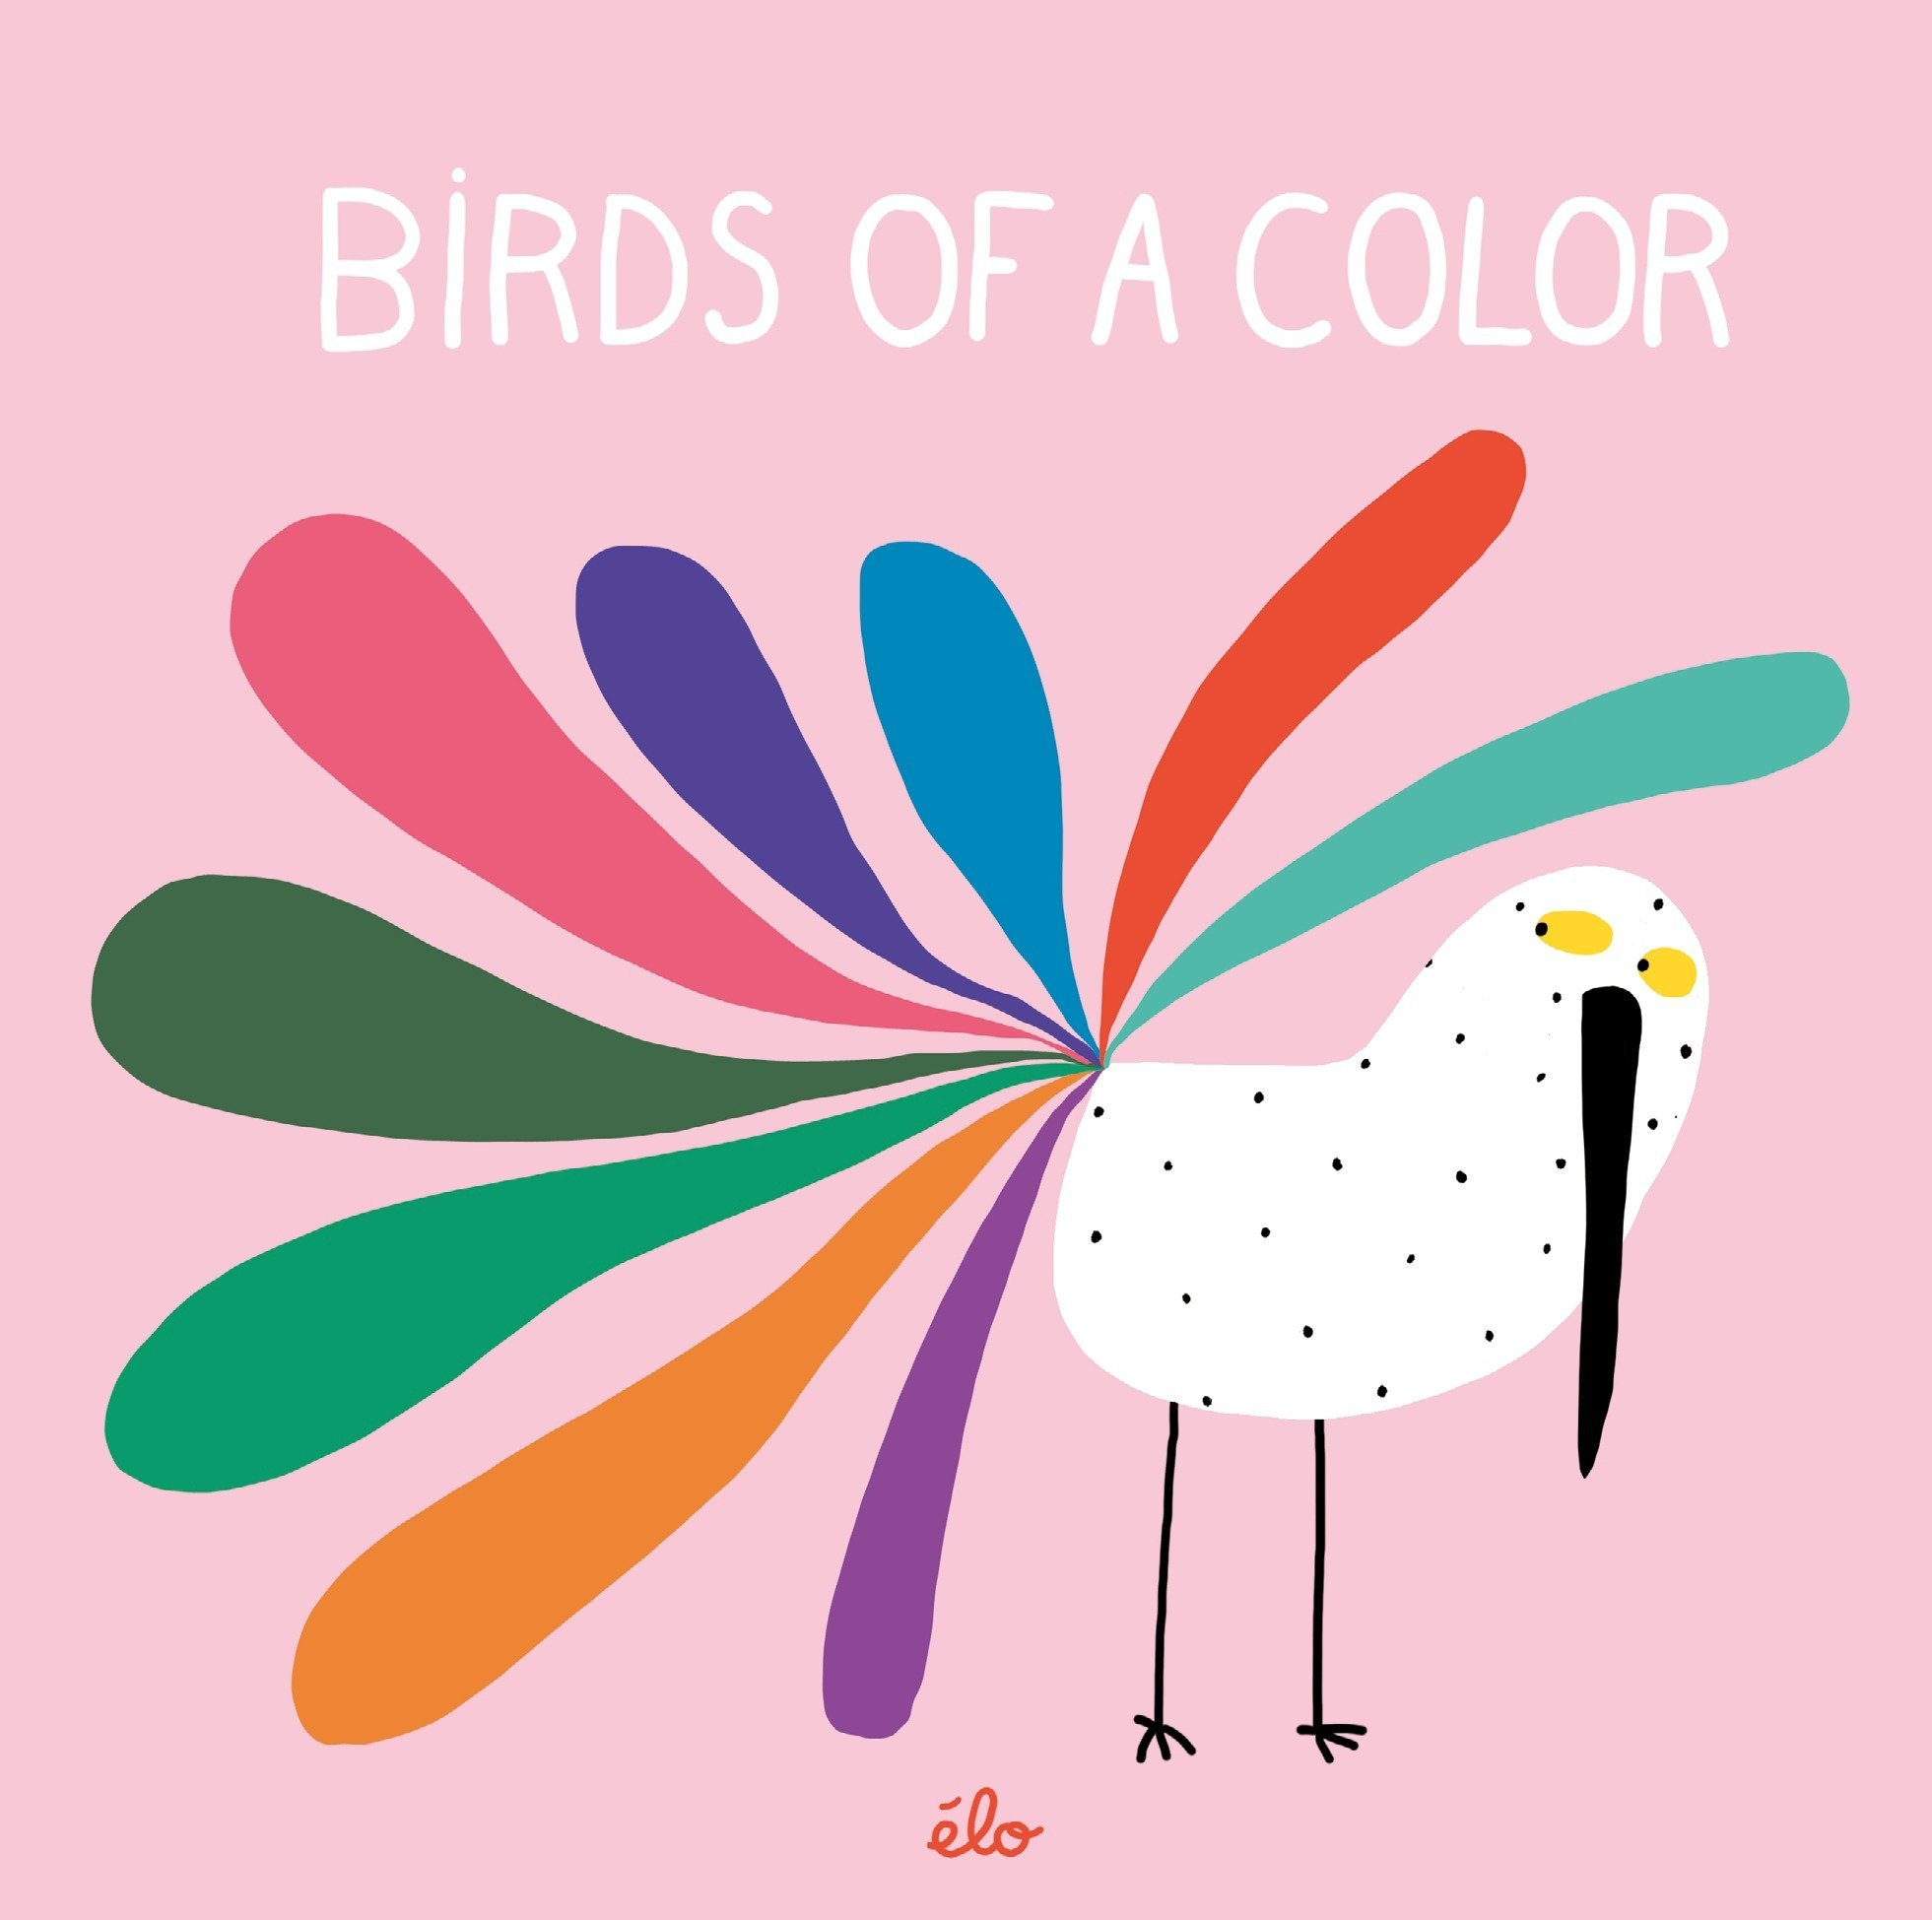 - Amazon.com: Birds Of A Color (9781536200638): élo, élo: Books